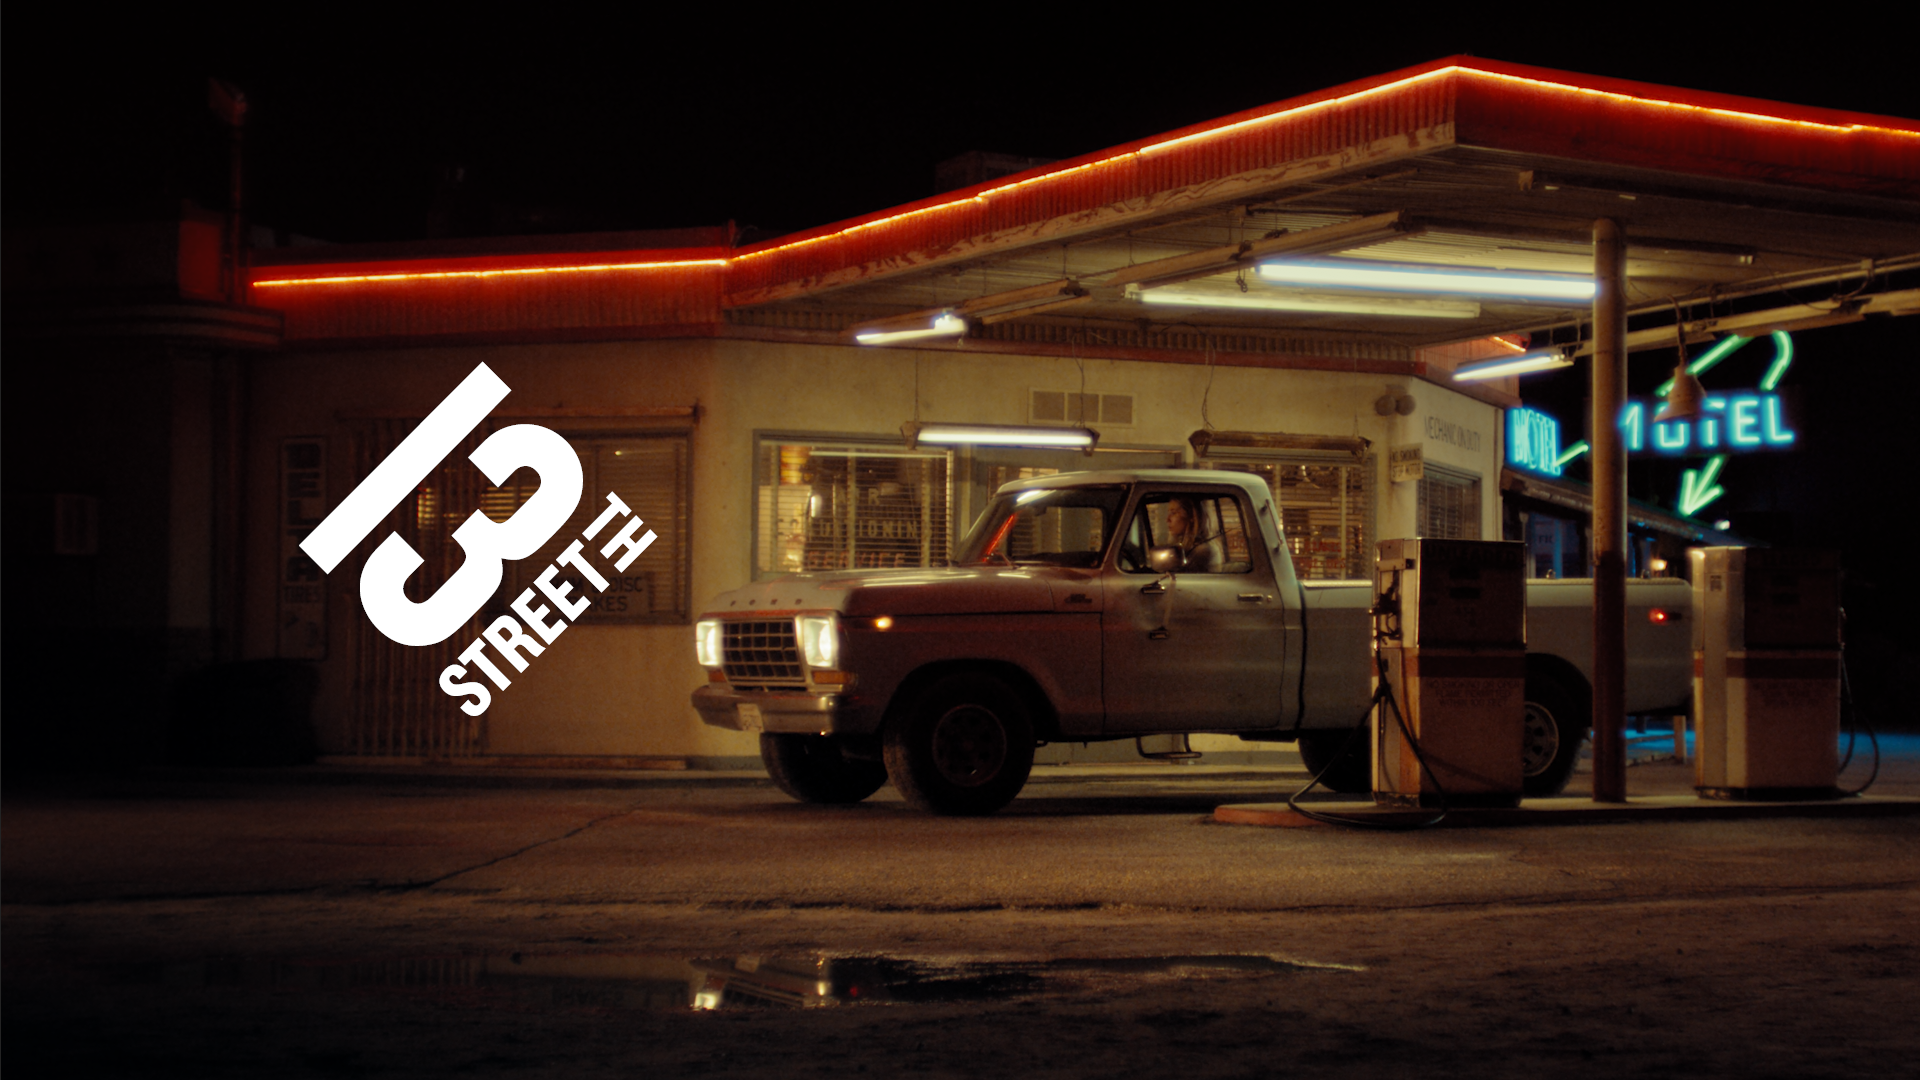 Thumbnail for 13th Street Rebrand